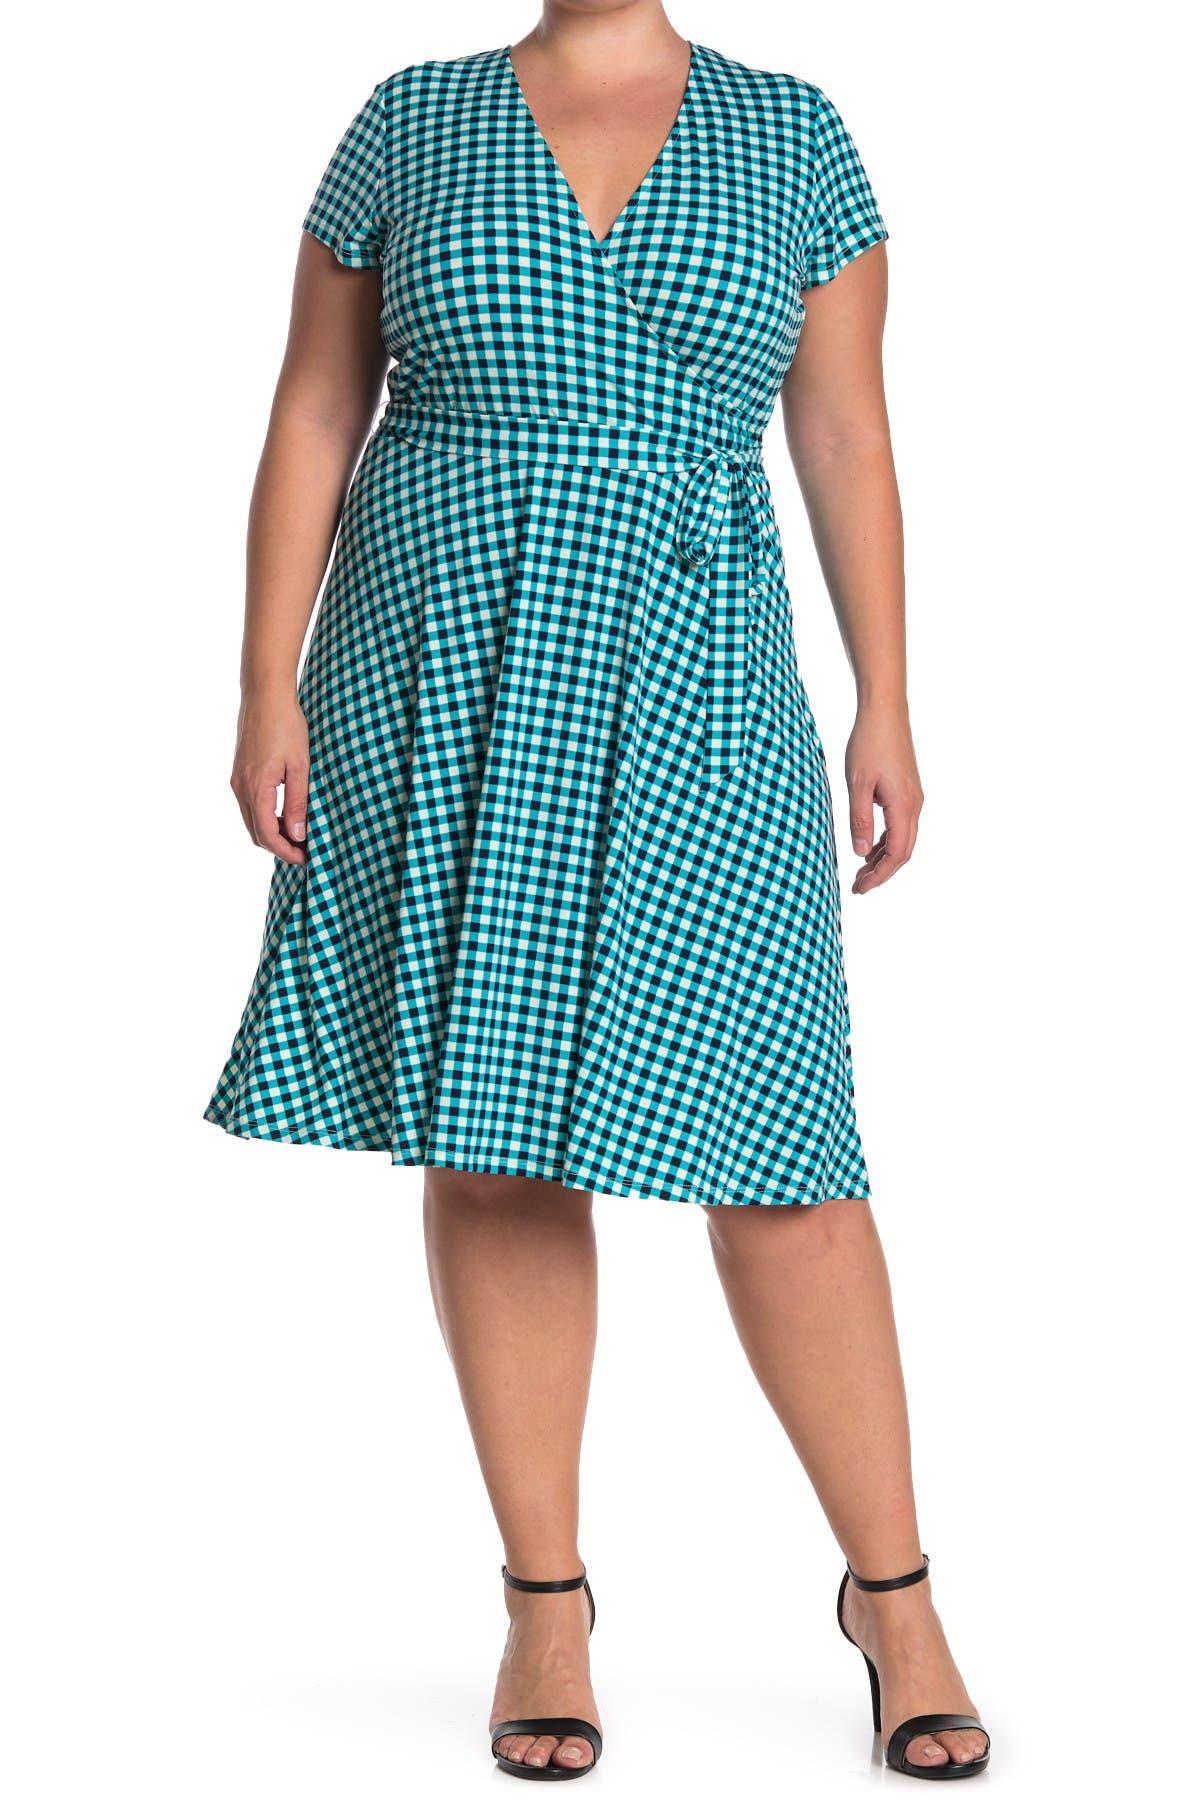 Image of Leota Belted Fit & Flare Dress